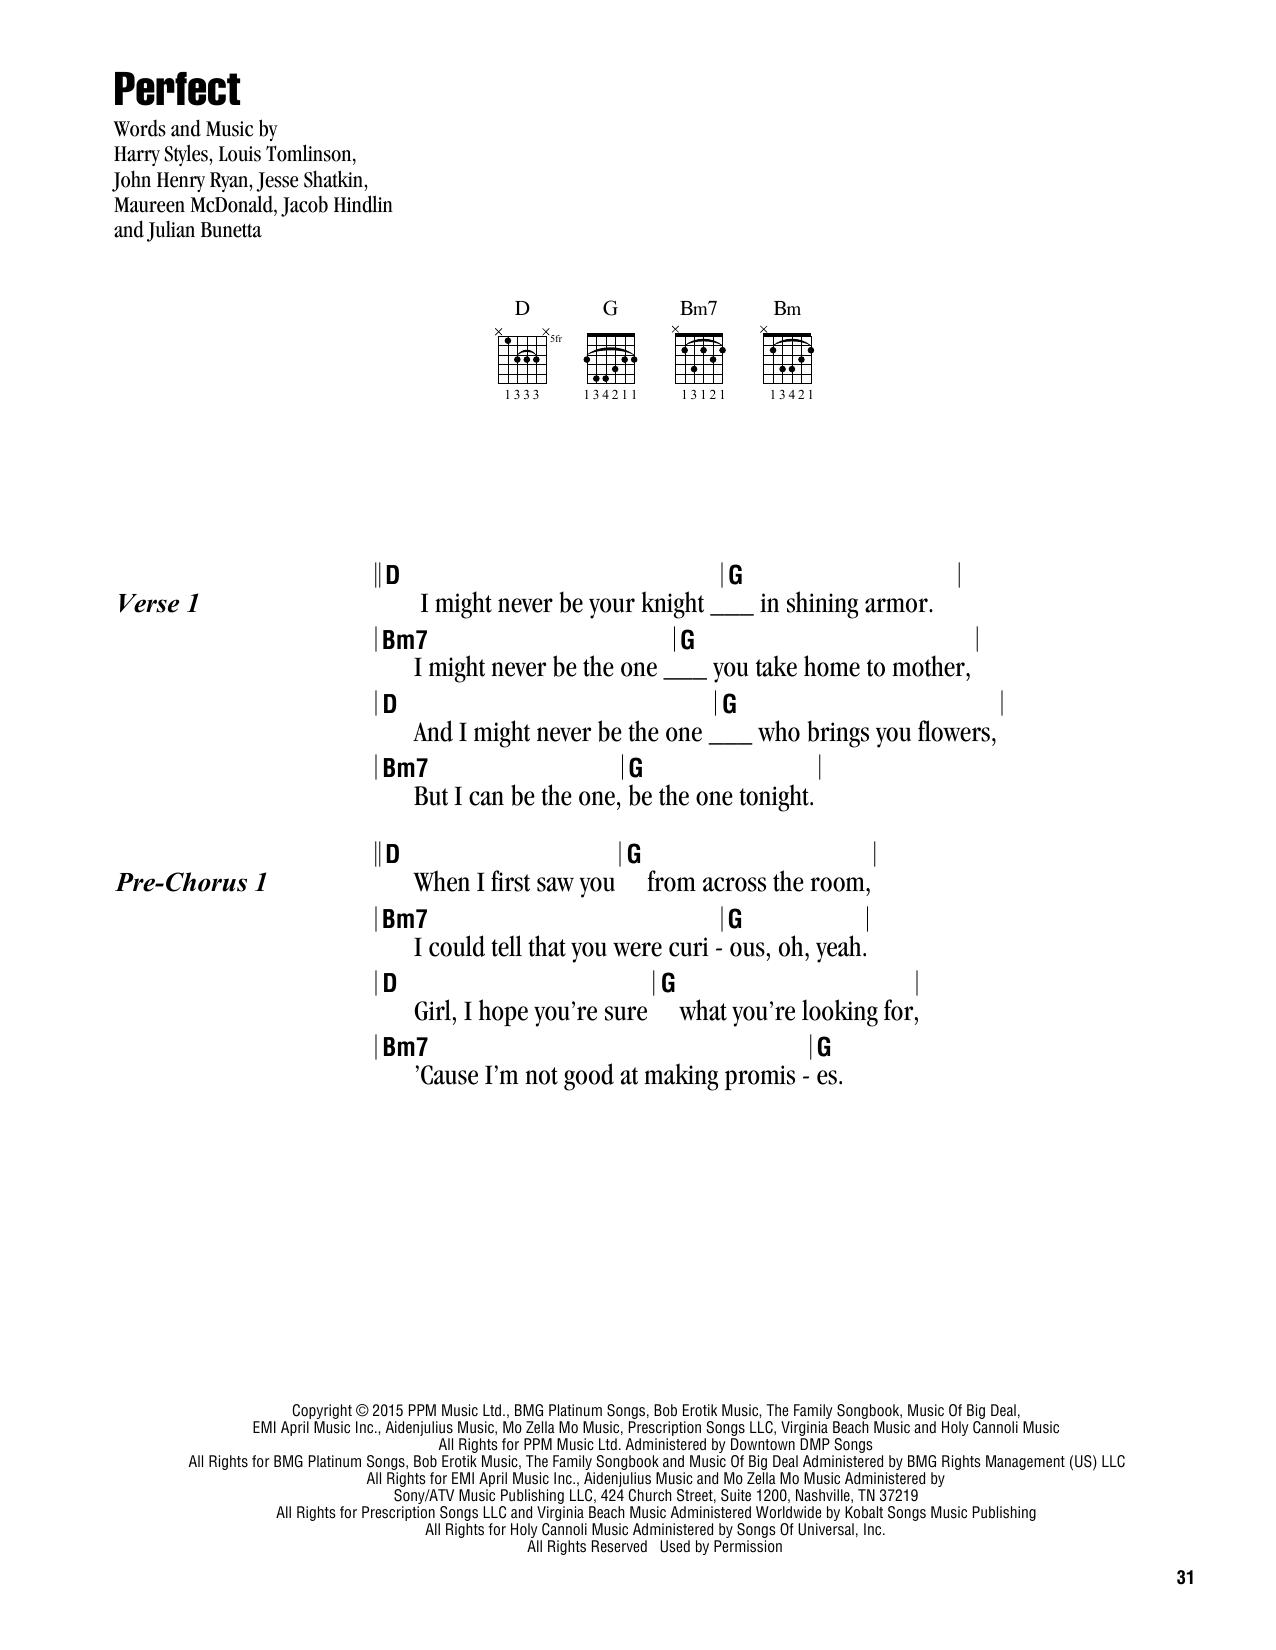 Sheet Music Digital Files To Print Licensed Jesse Shatkin